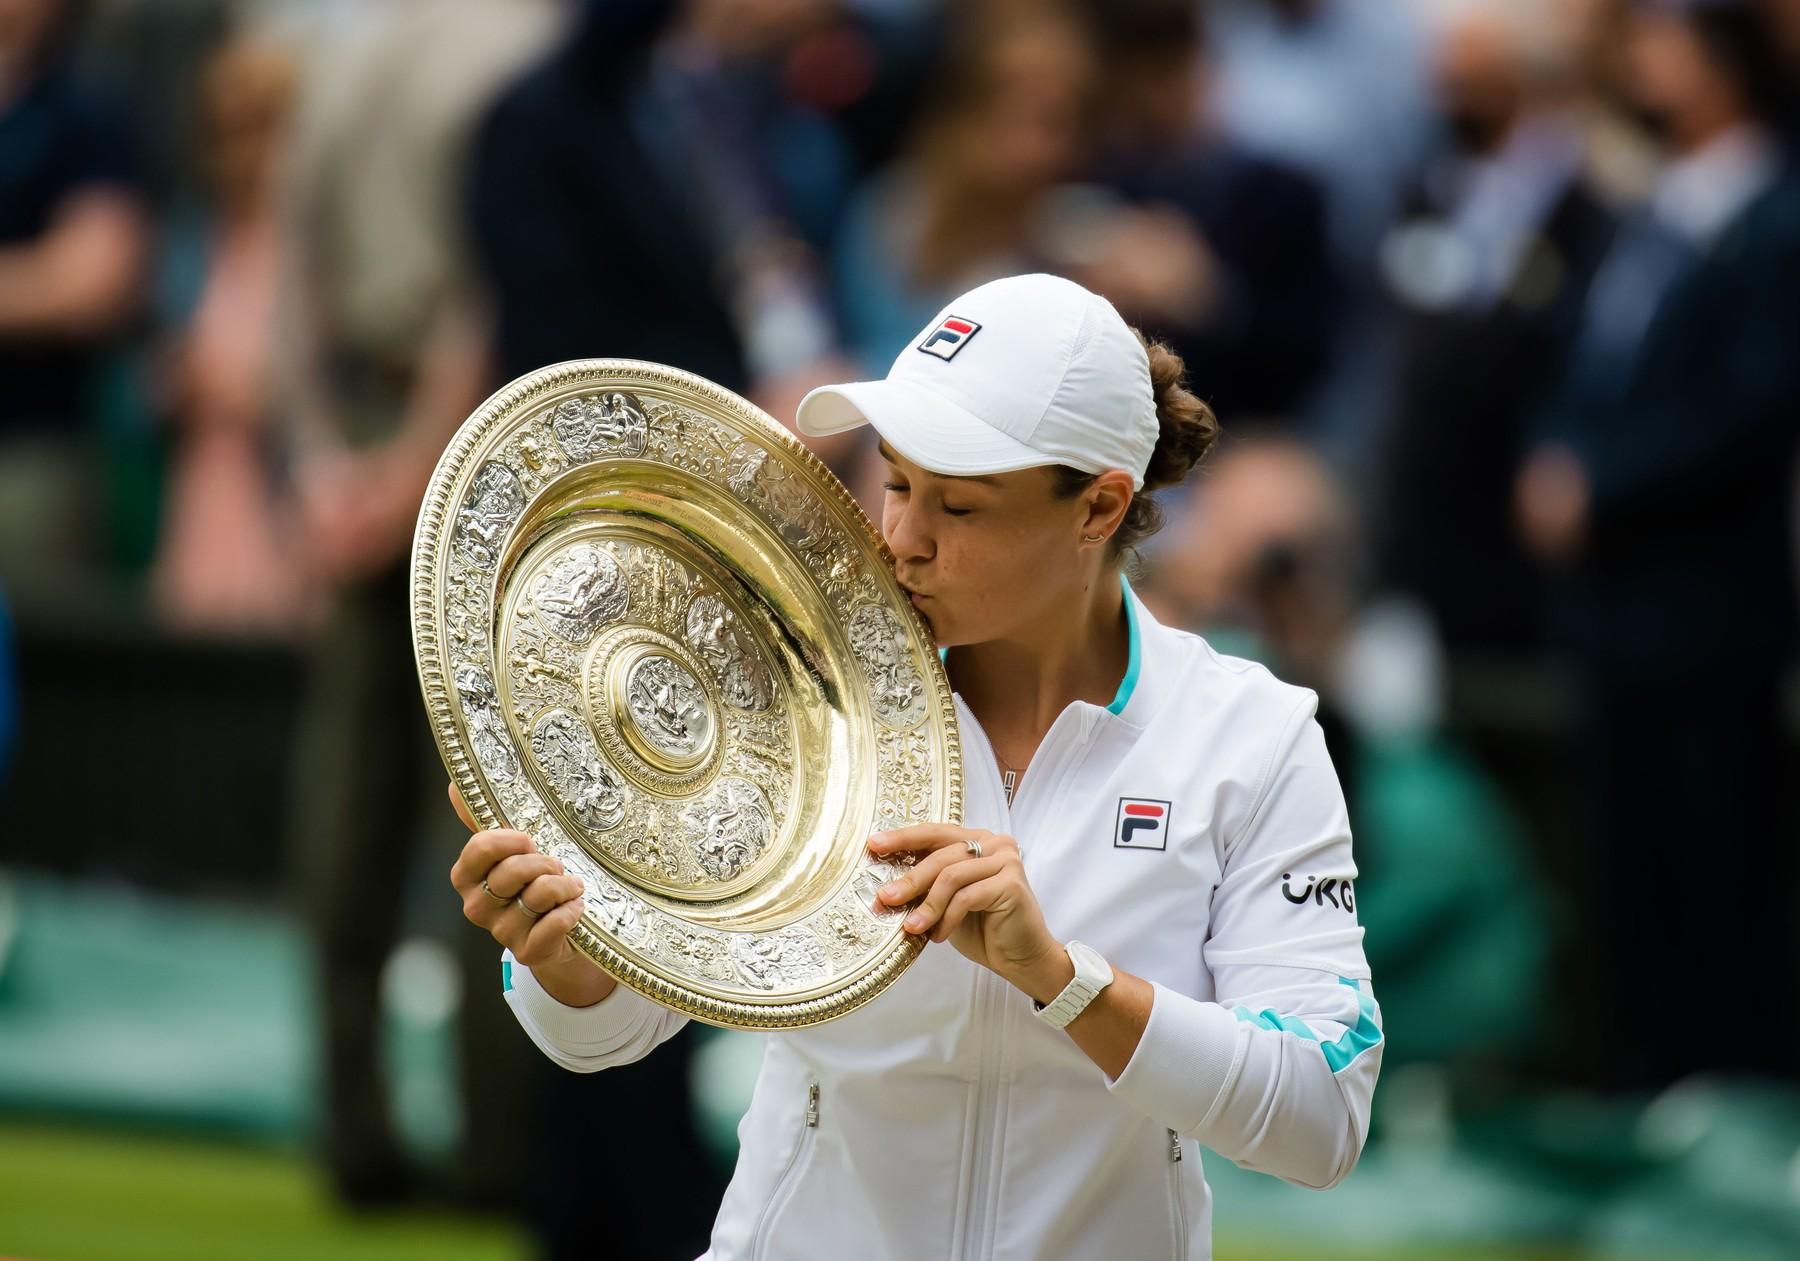 Wimbledon Tennis Championships, Day 12, The All England Lawn Tennis and Croquet Club, London, UK – 10 Jul 2021